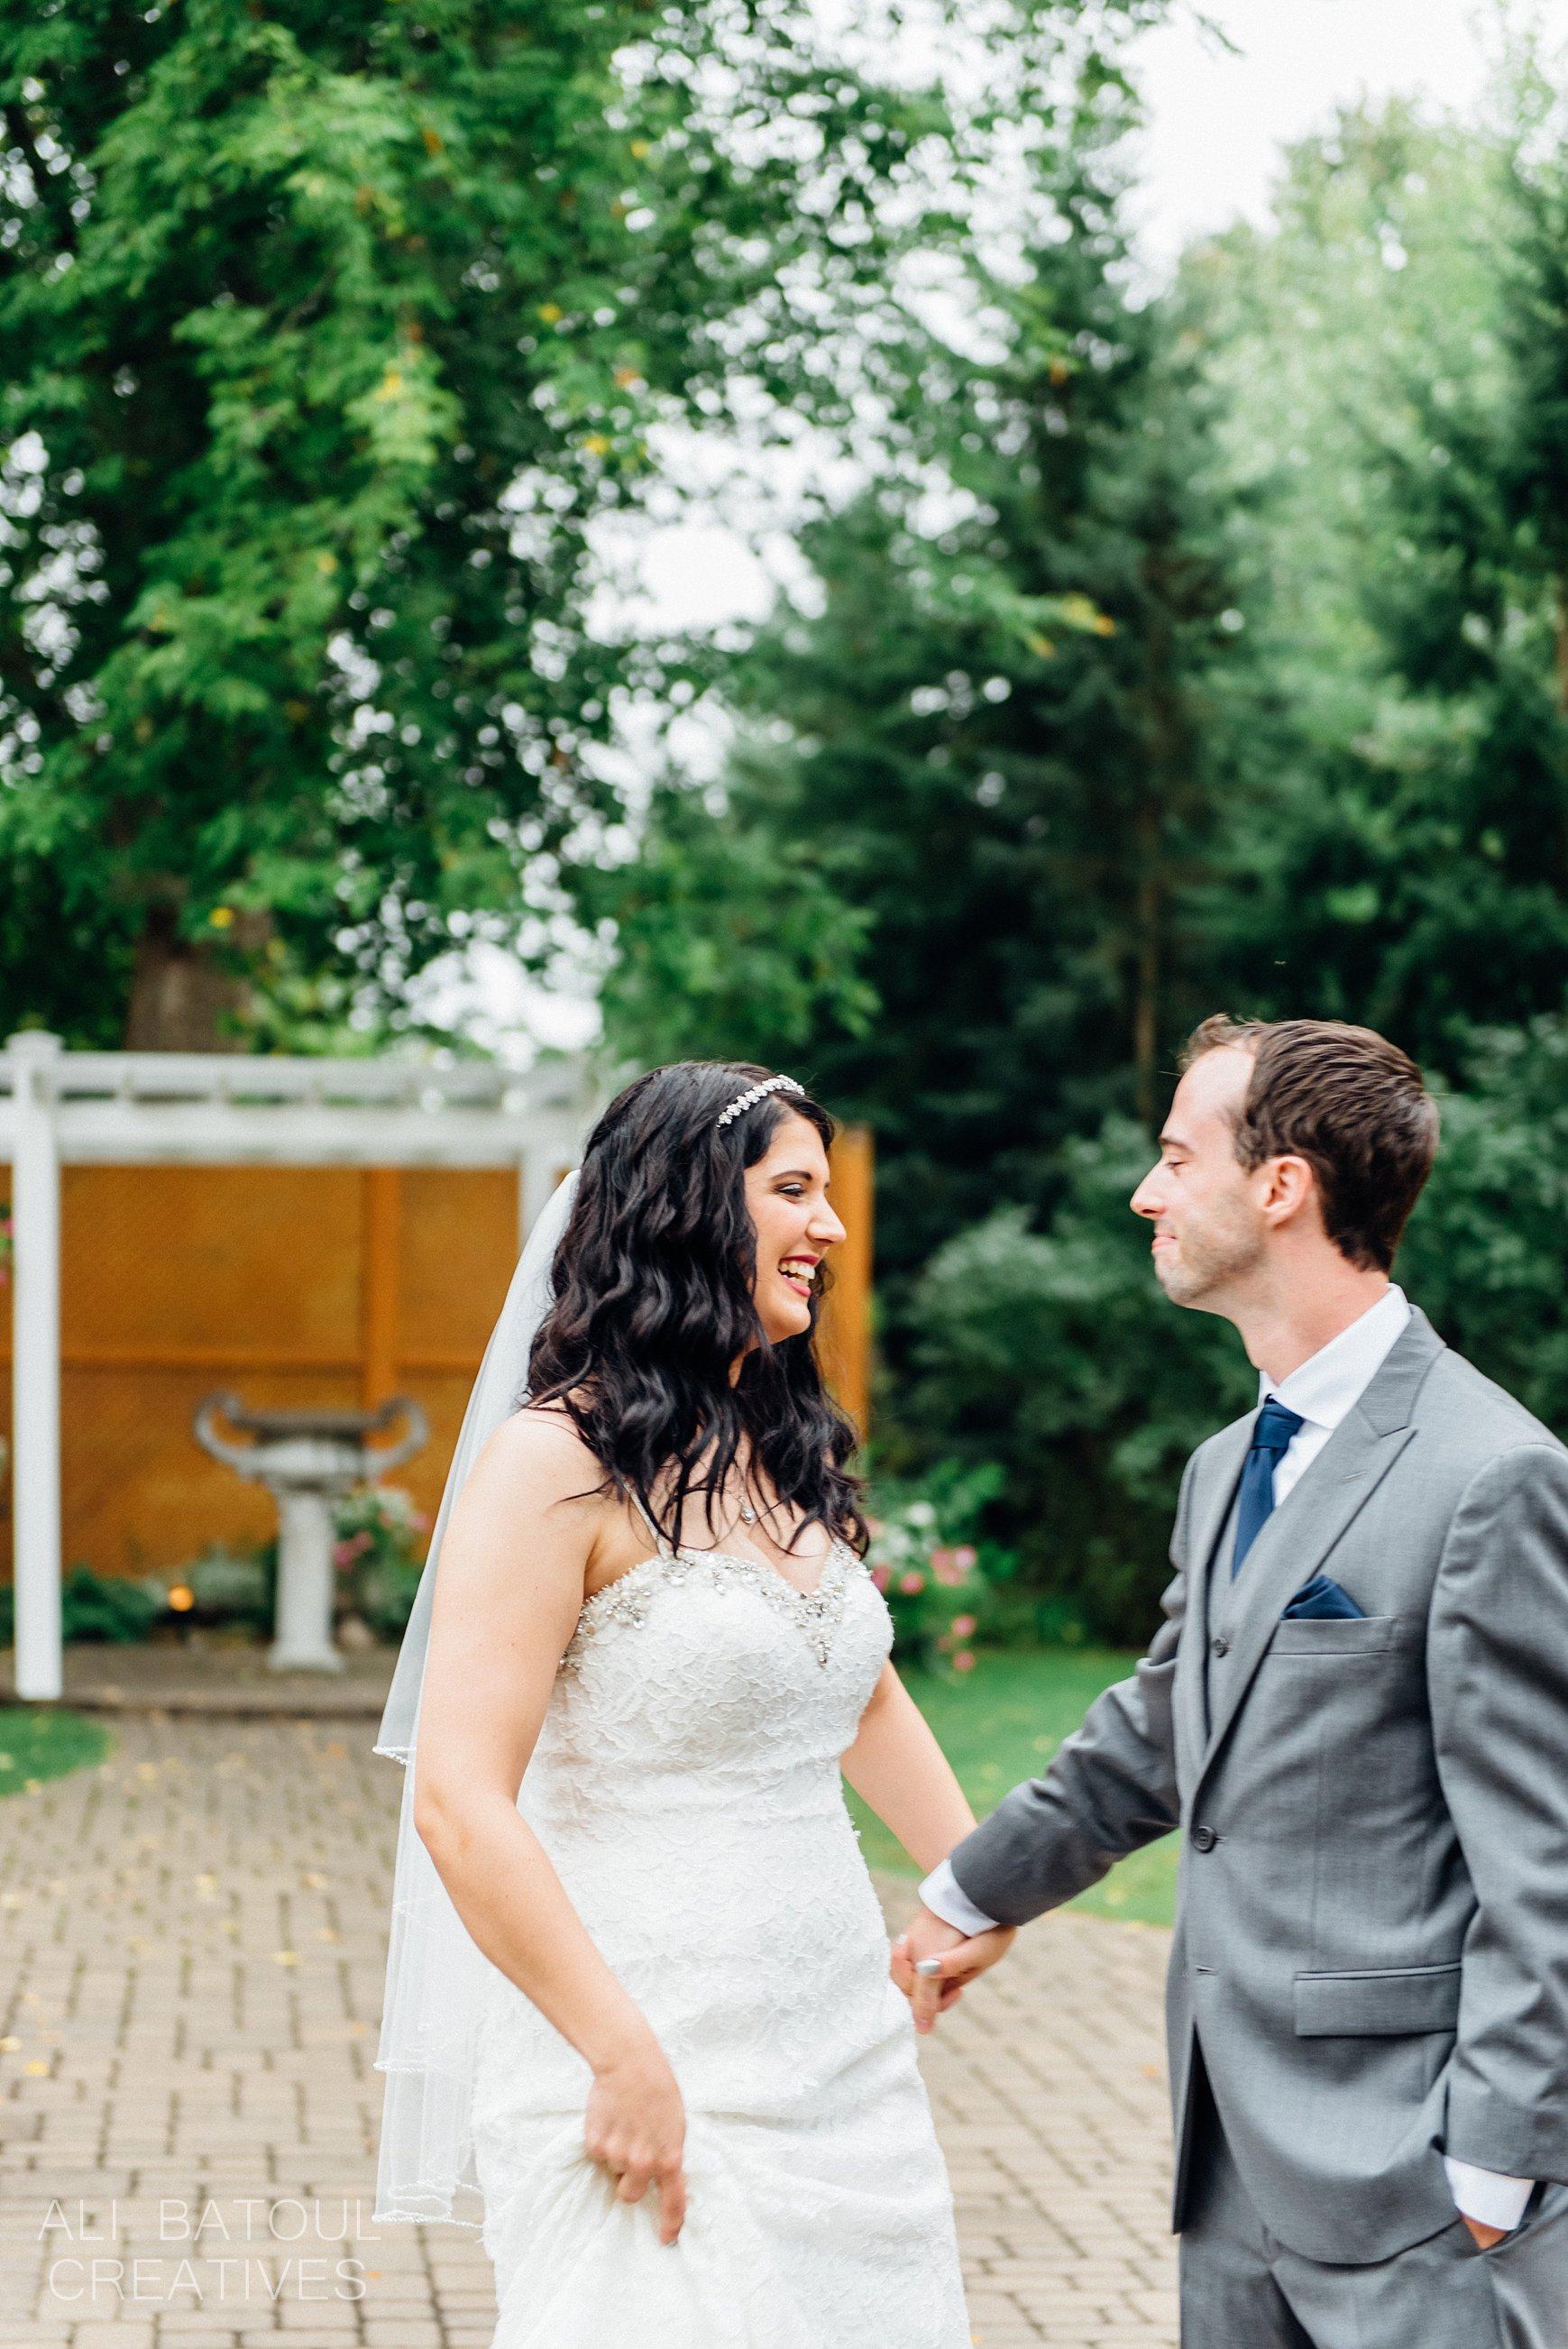 Jocelyn + Steve At The Schoolhouse Wedding - Ali and Batoul Fine Art Wedding Photography_0033.jpg